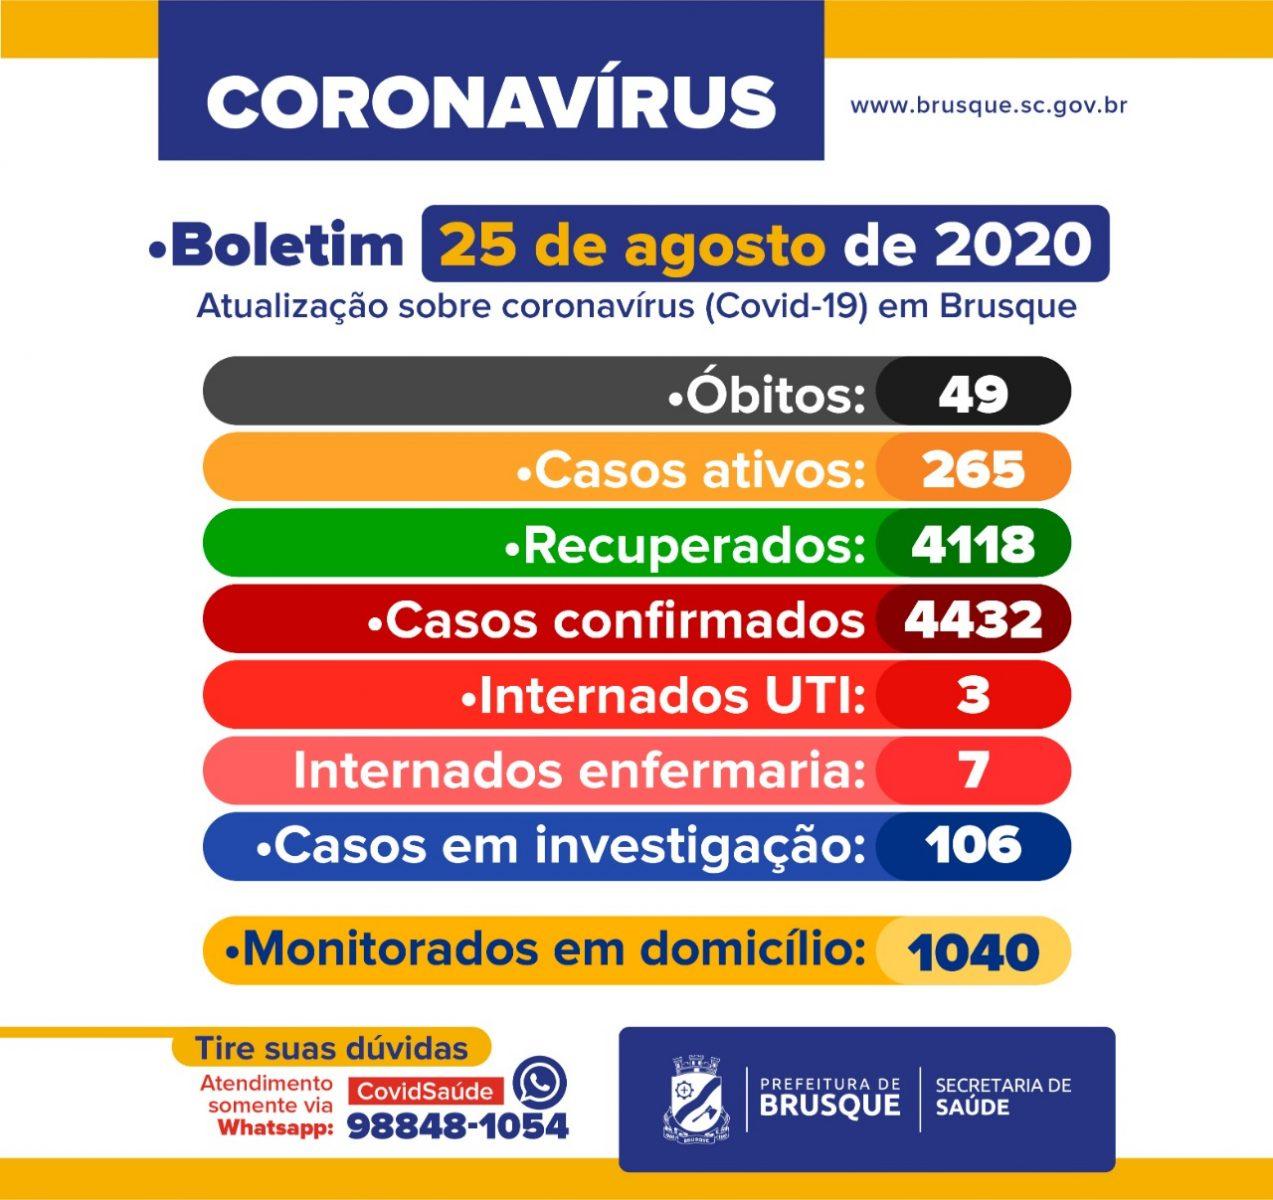 COVID-19: Boletim epidemiológico desta terça-feira (25) de agosto